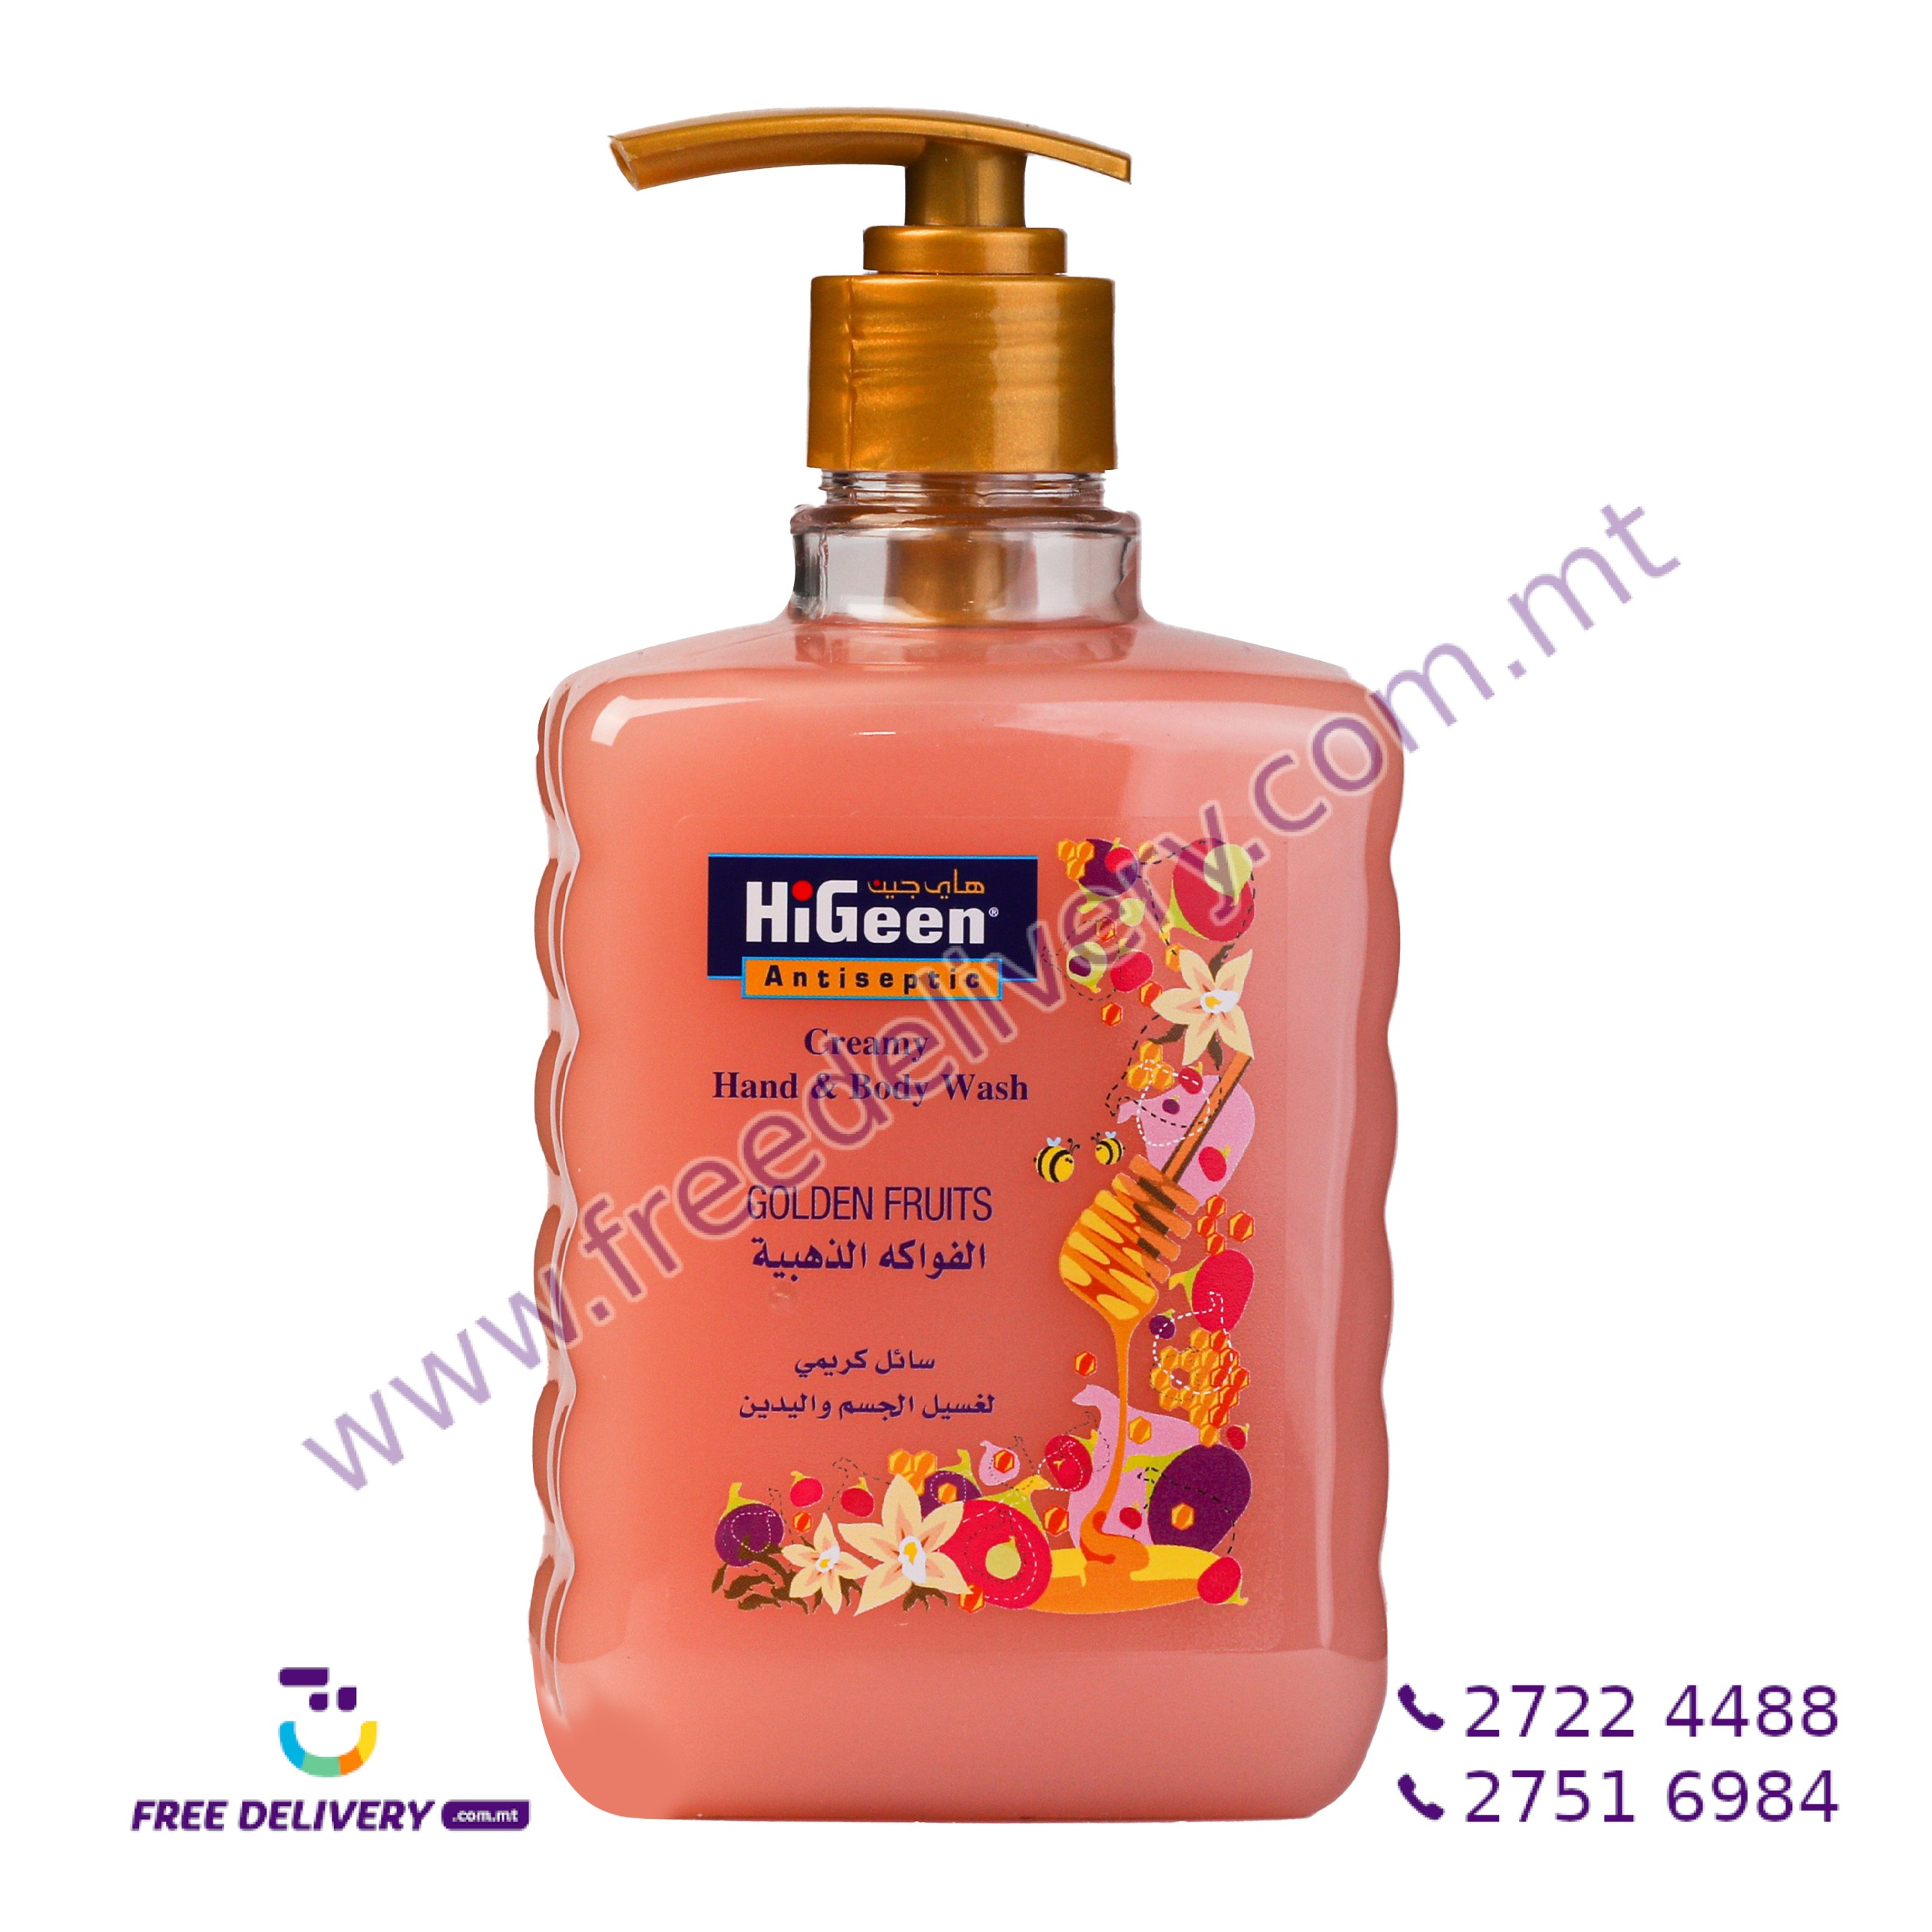 HIGEEN CREAMY HAND & BODY WASH GOLDEN FRUITS 500ML HI003172